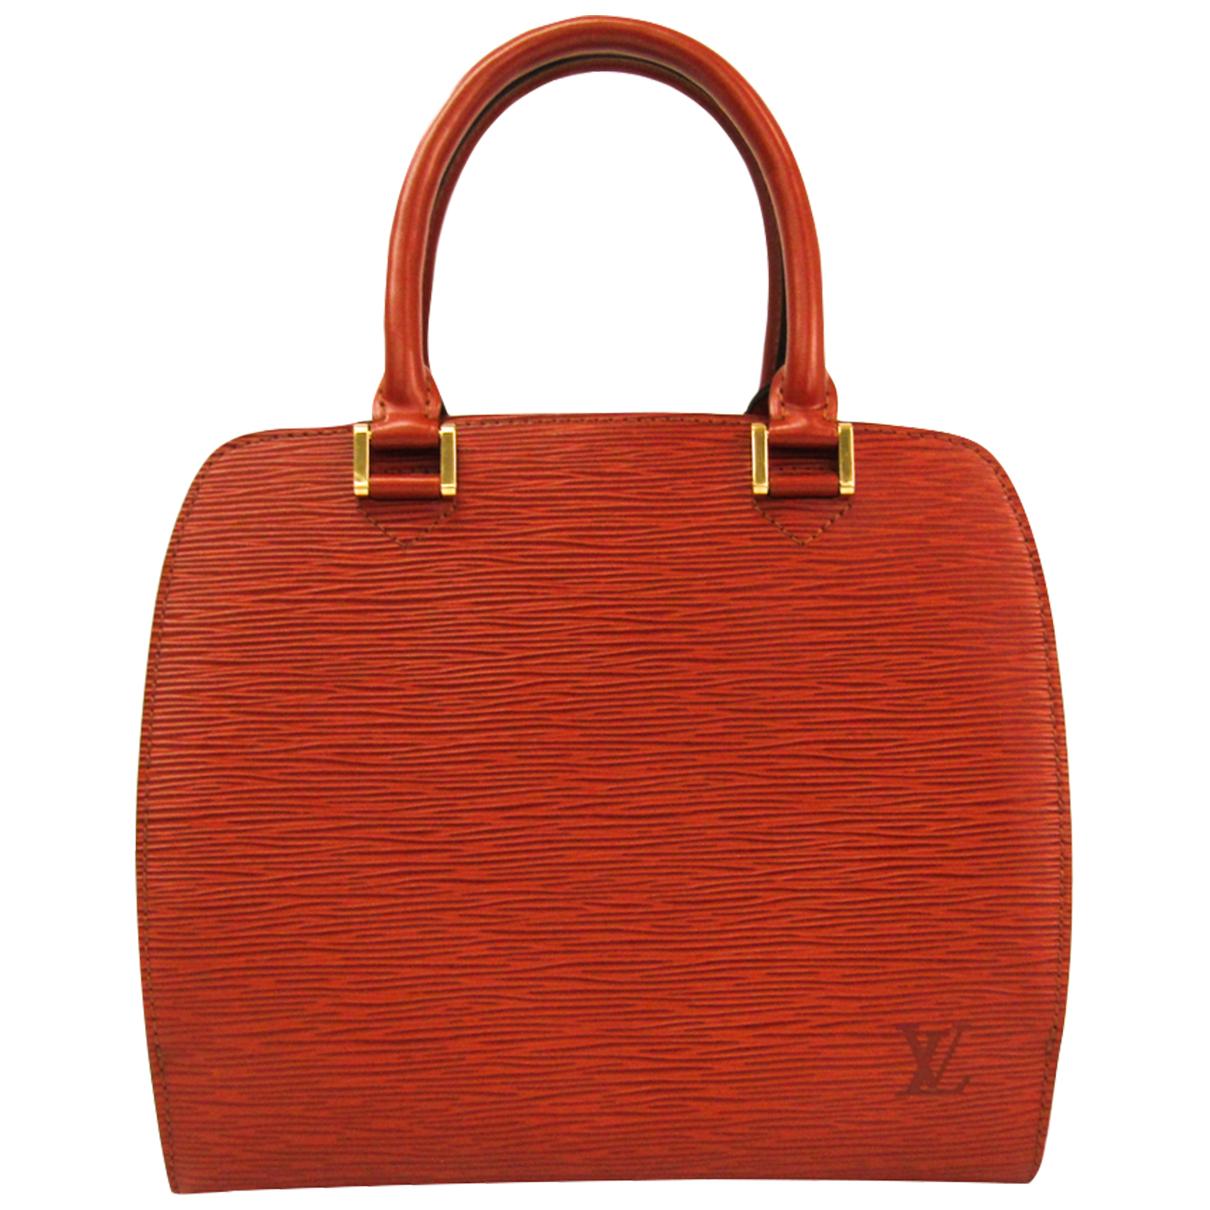 Louis Vuitton Pont Neuf Vintage  Brown Leather handbag for Women N